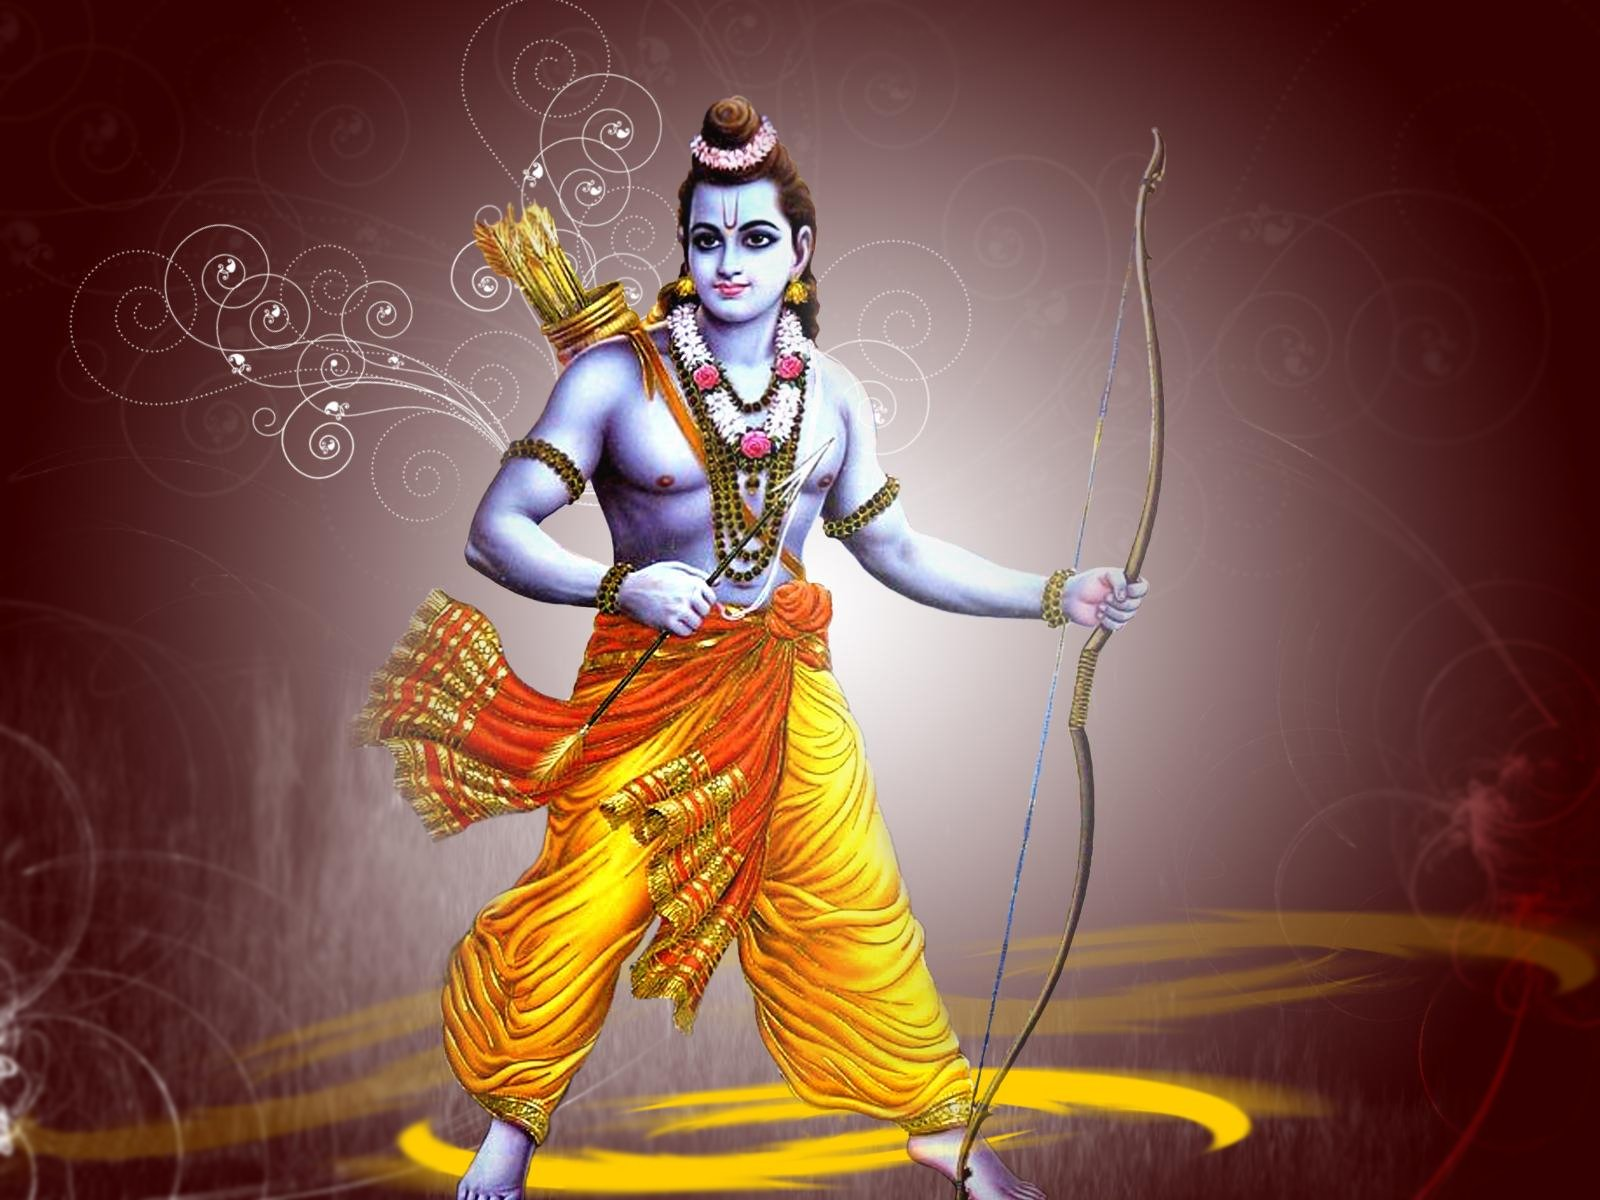 Shri Ram Wallpaper